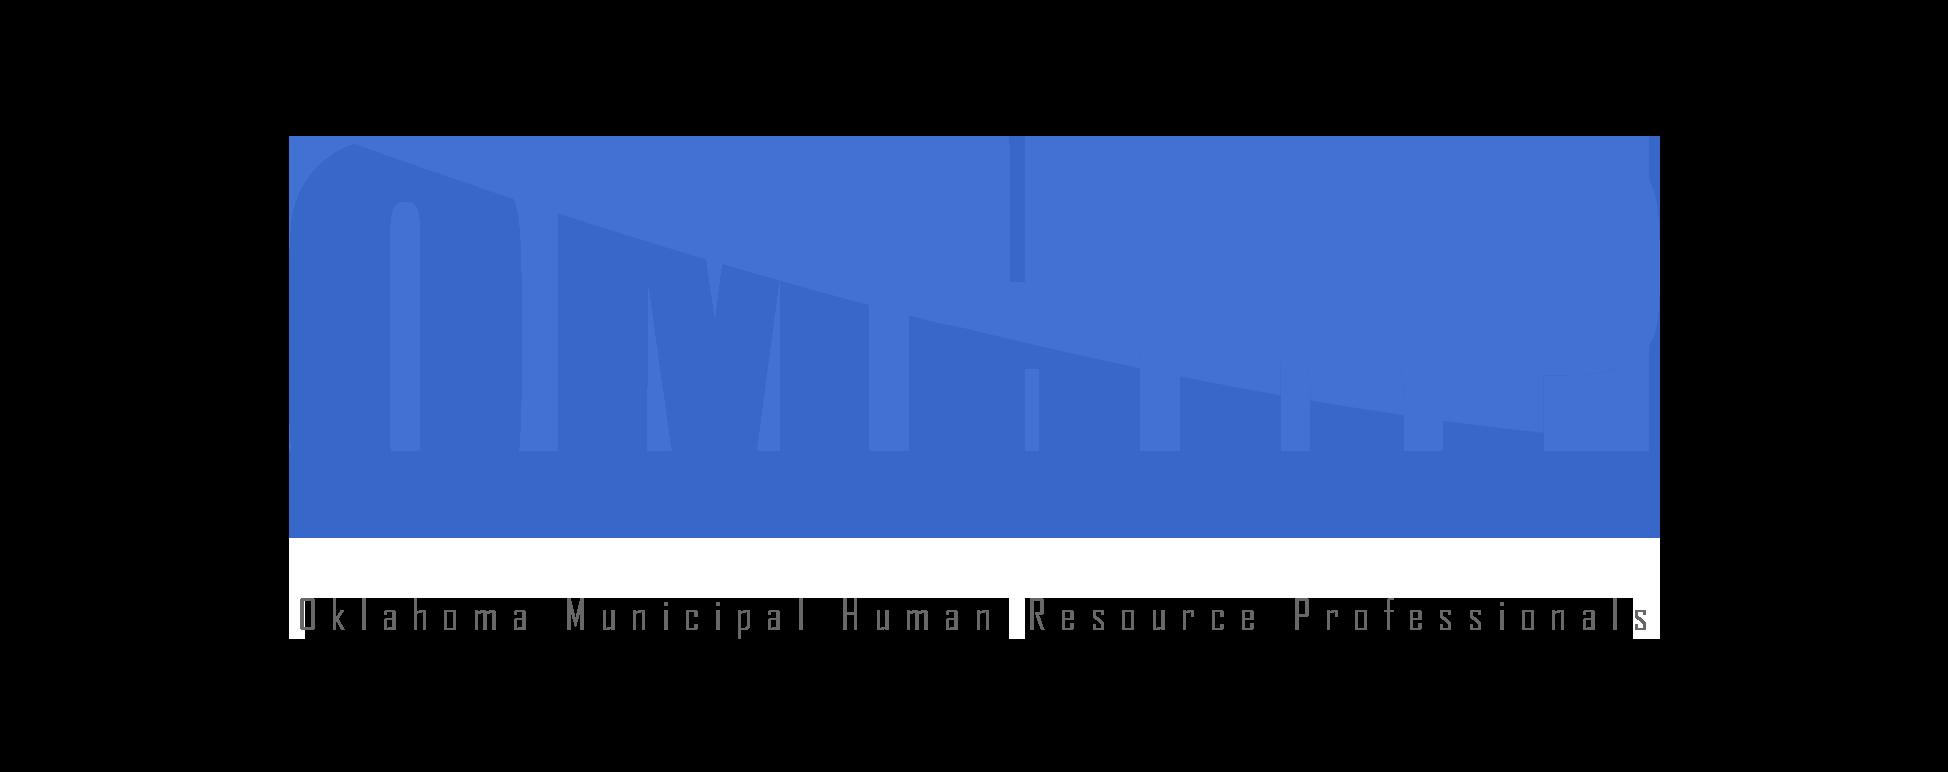 OMHRP Logo trans.png